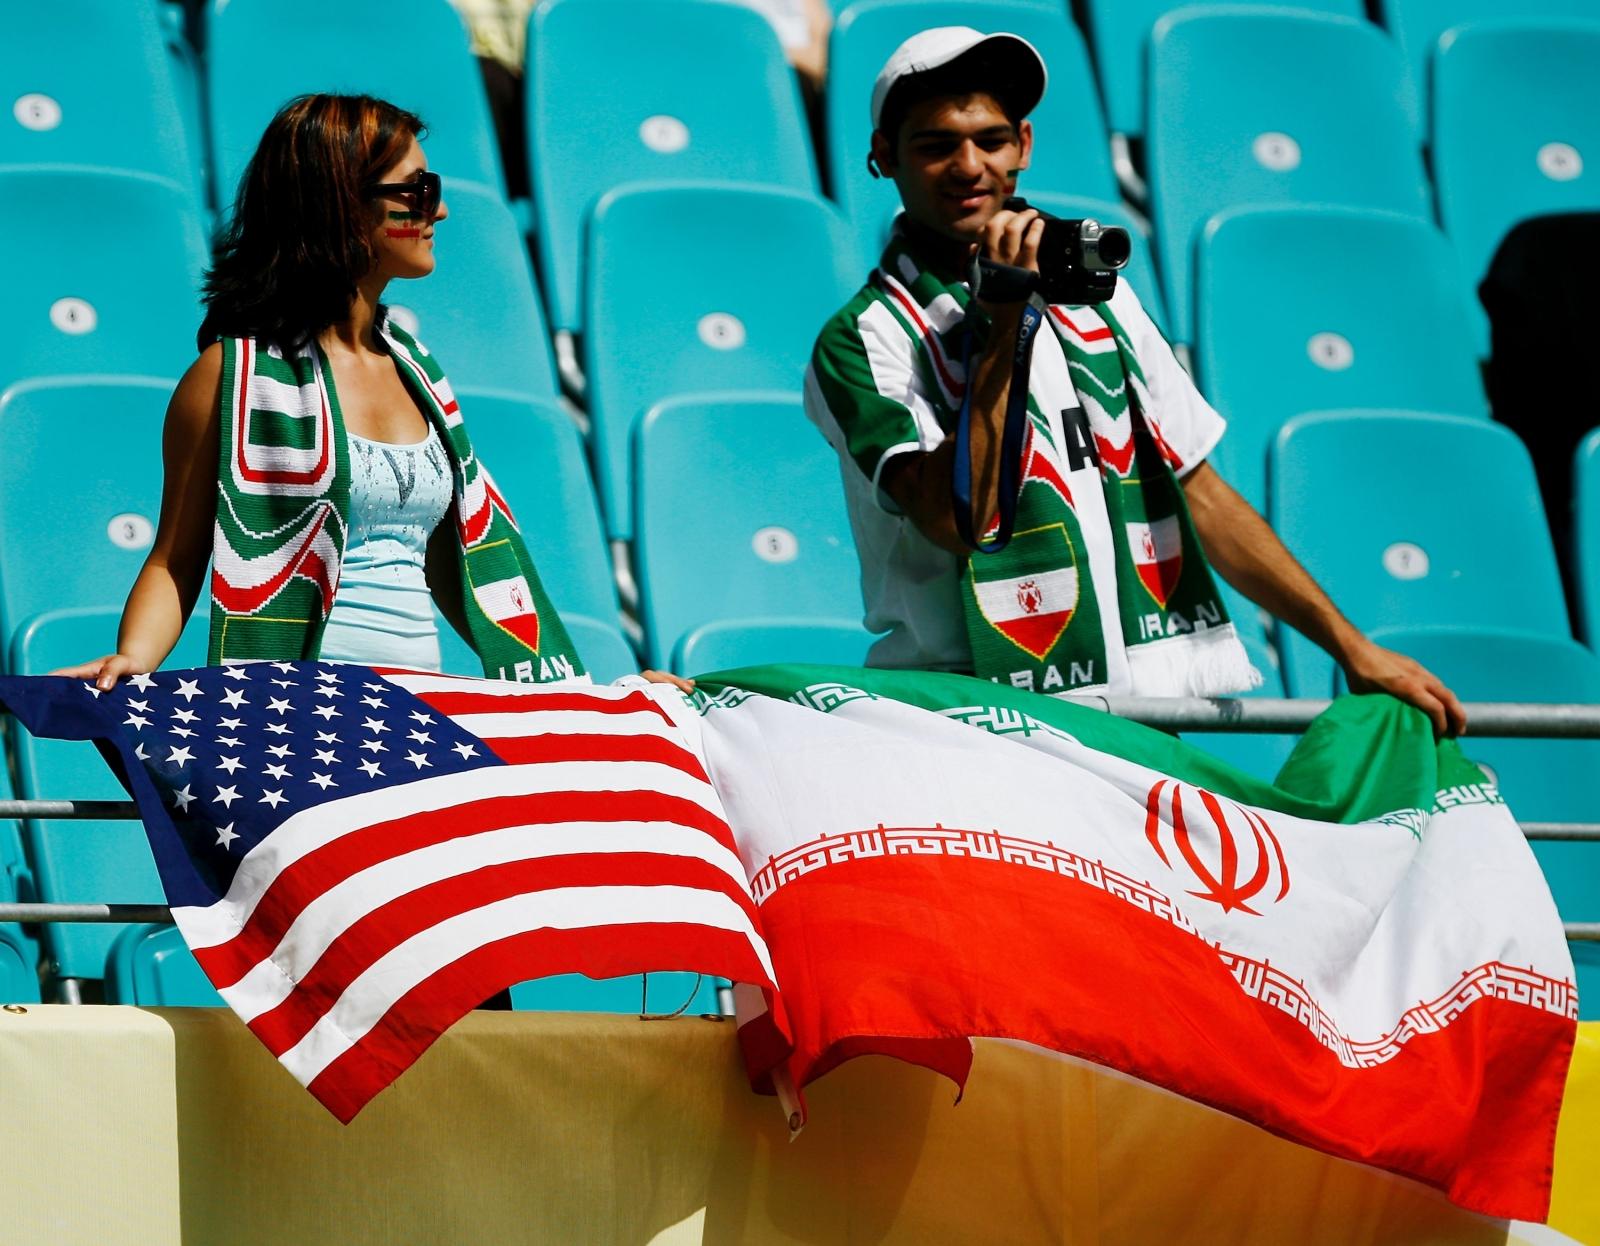 Iran US flag